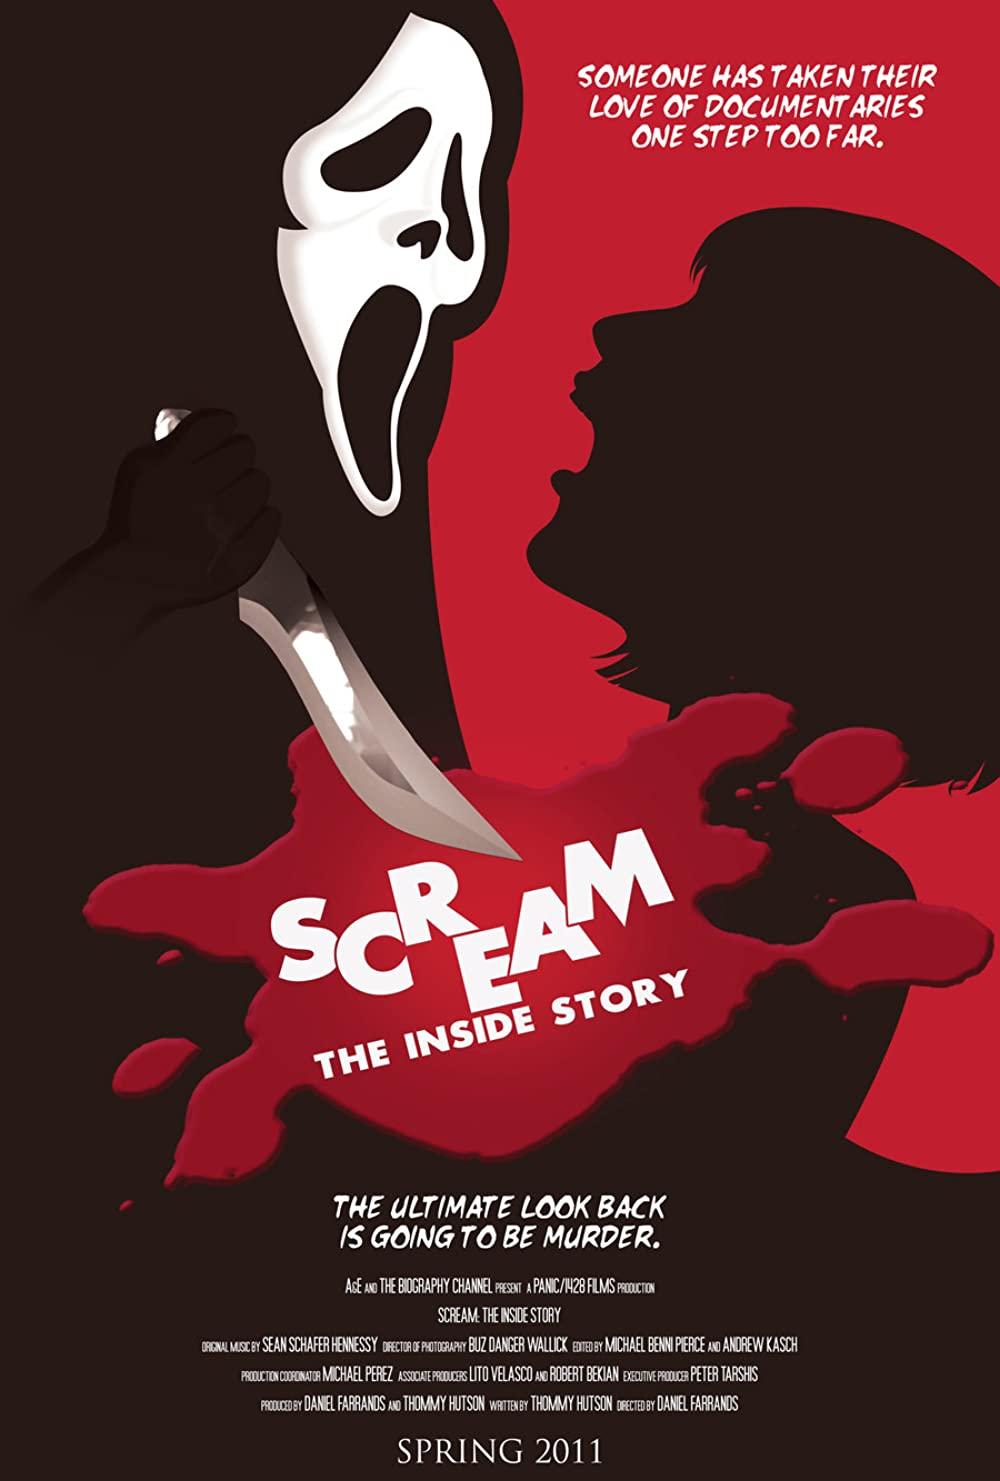 Scream The Inside Story Poster